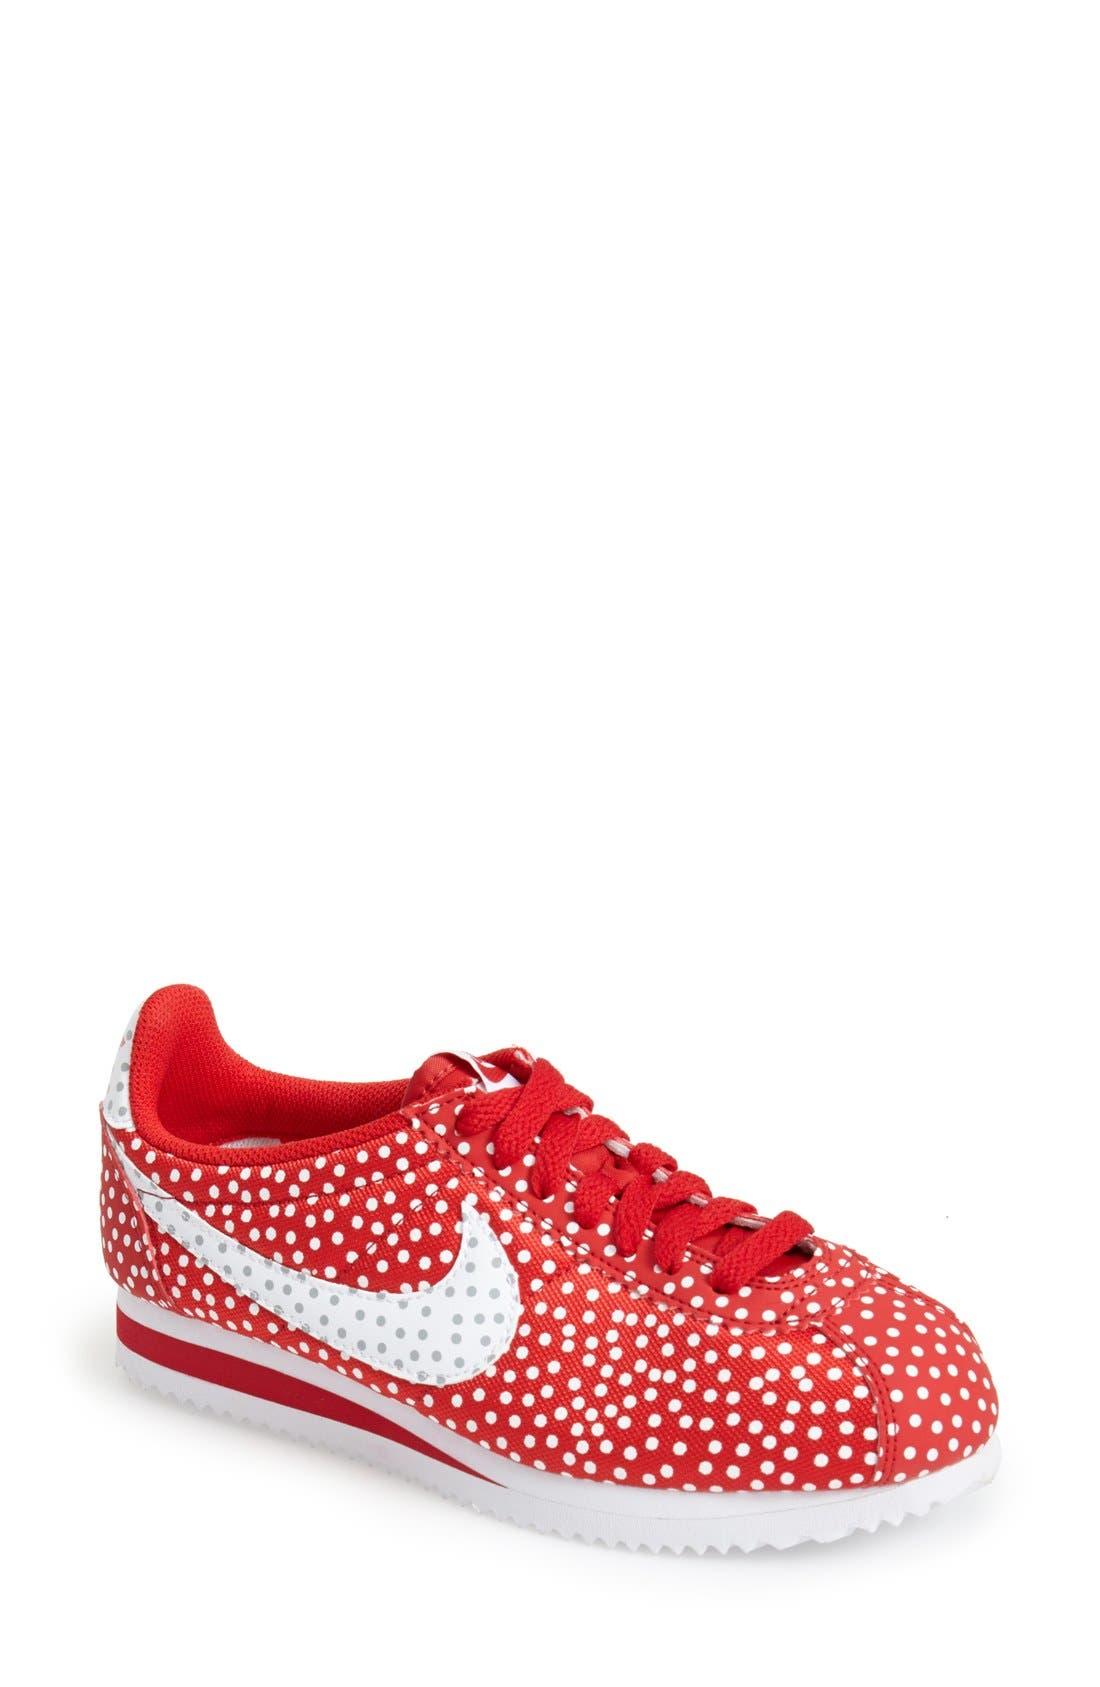 Alternate Image 1 Selected - Nike 'Cortez - Polka Dot Print' Sneaker (Women)